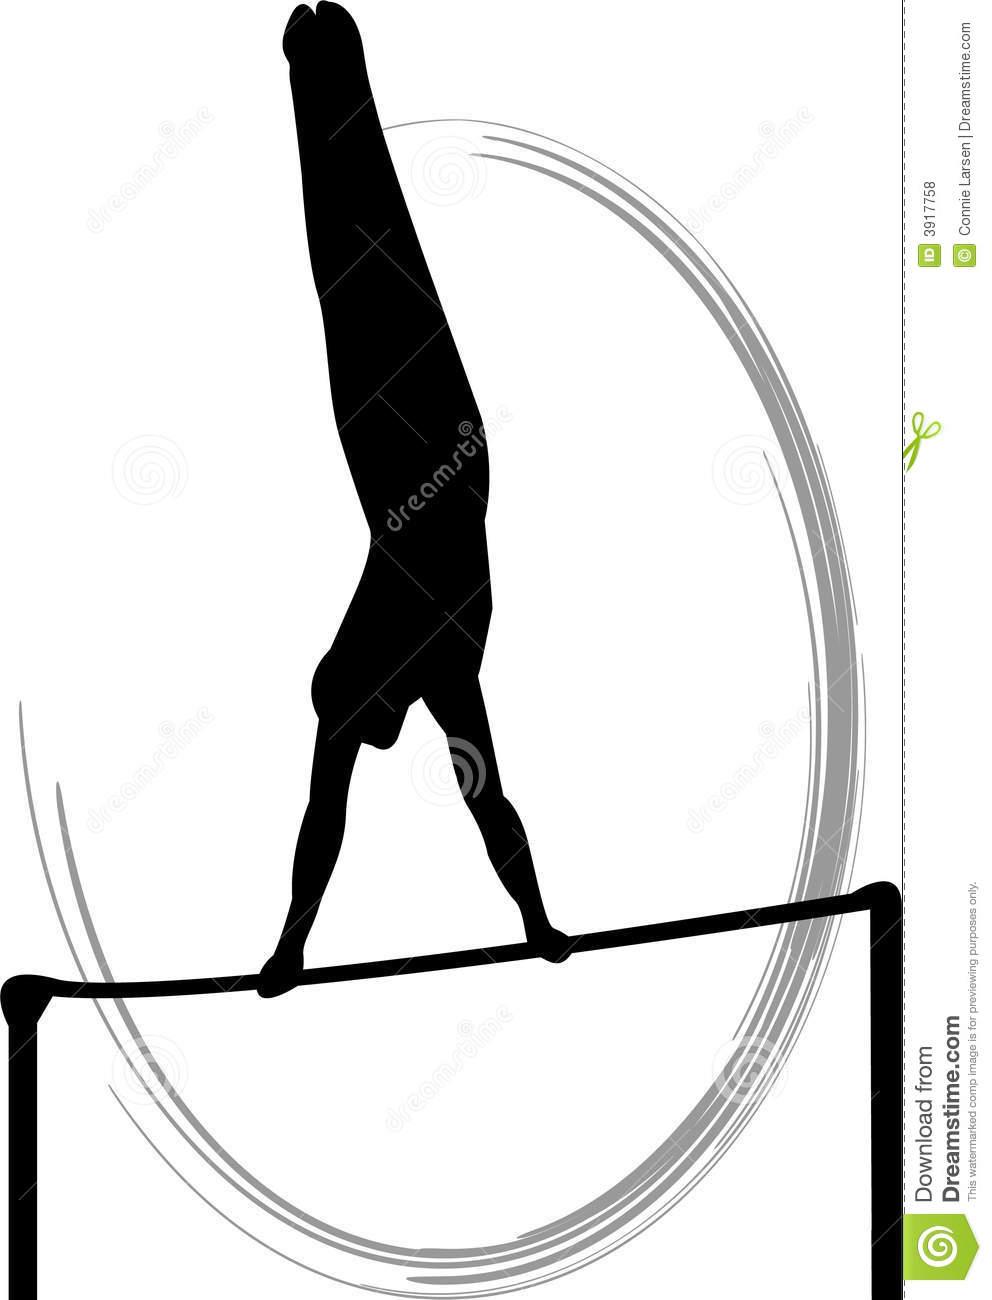 992x1300 Gymnastics Silhouette Clipart